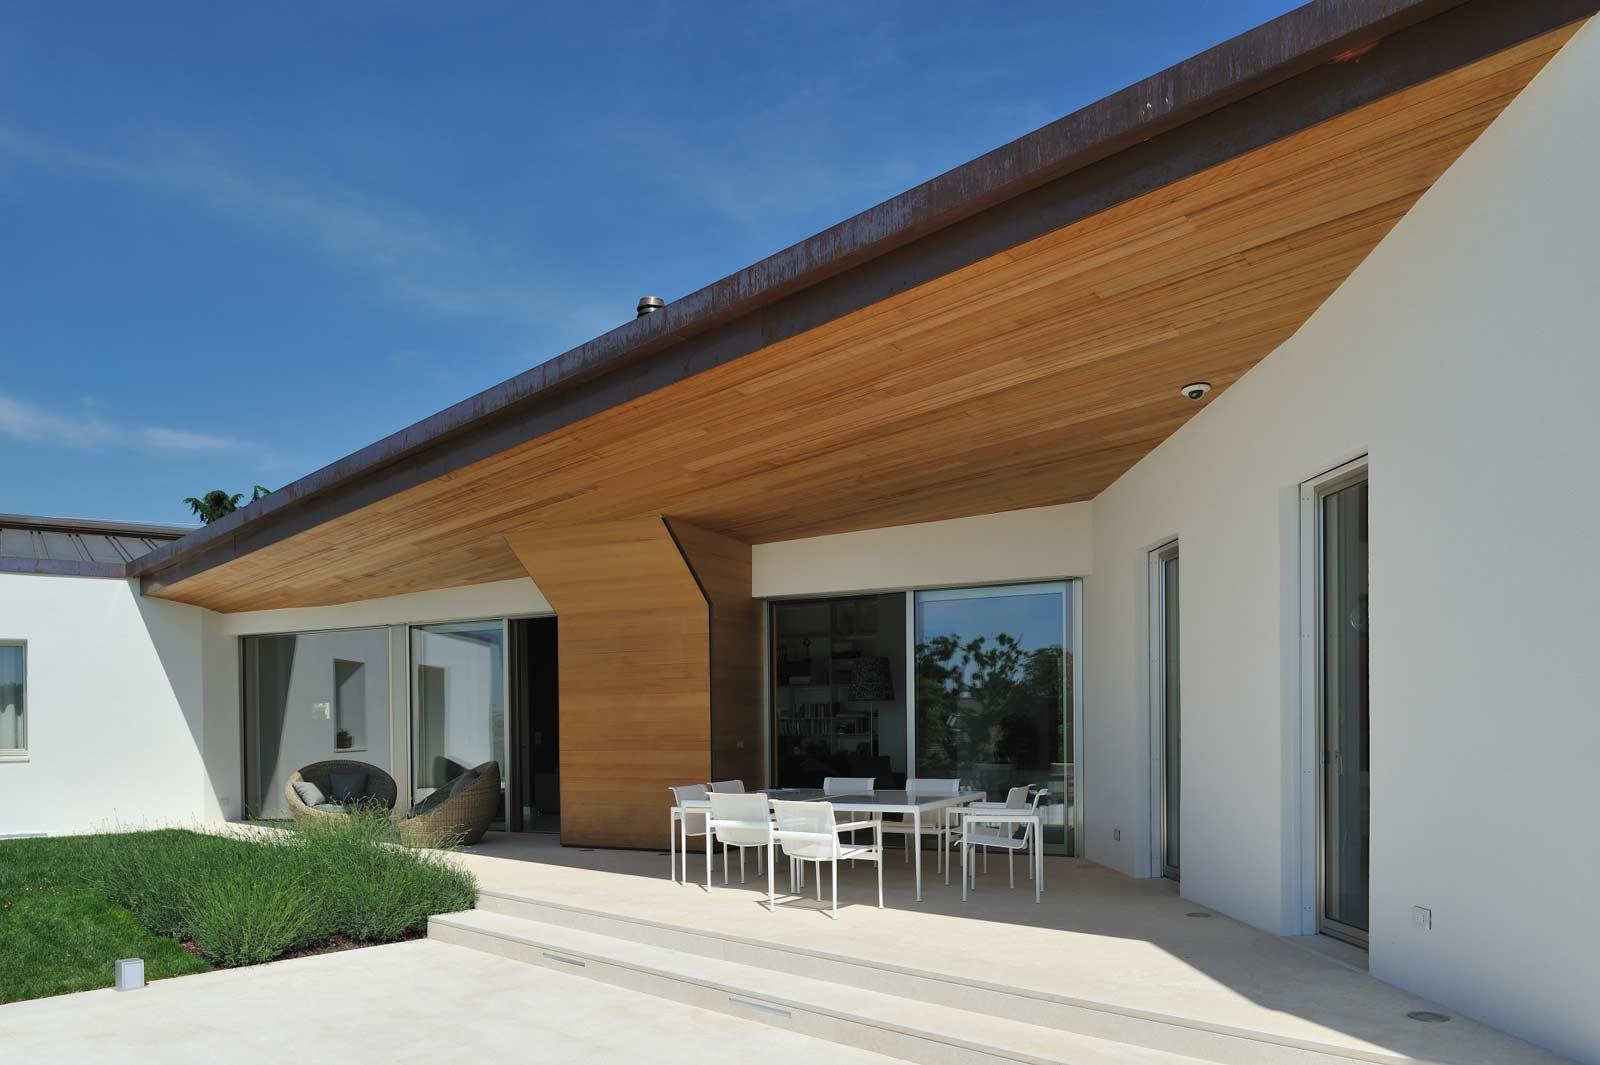 Casa moderna Woodbau a Treviso